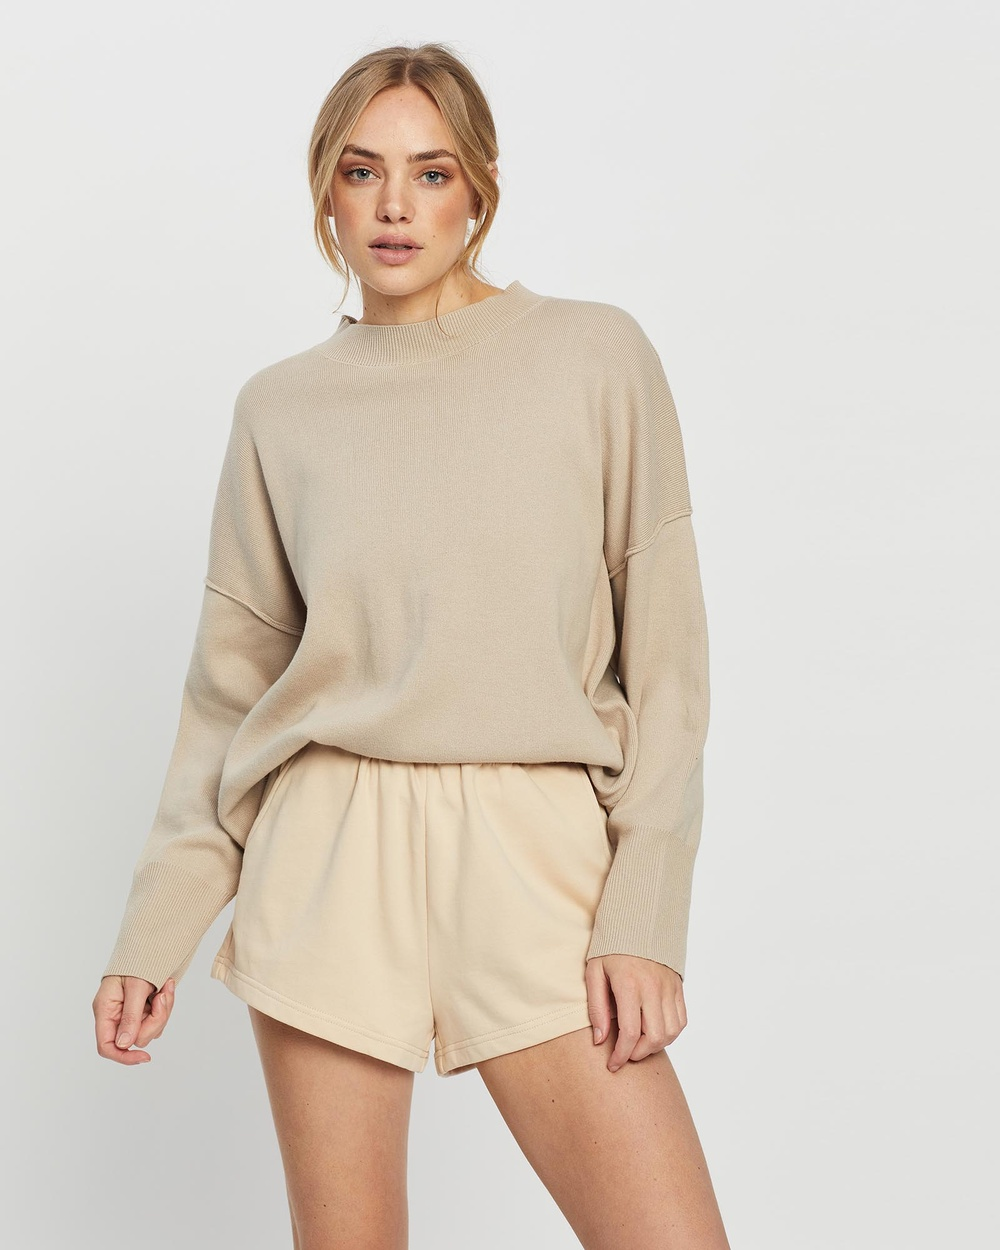 All Fenix Lara Lounge Sweater Hoodies Stone